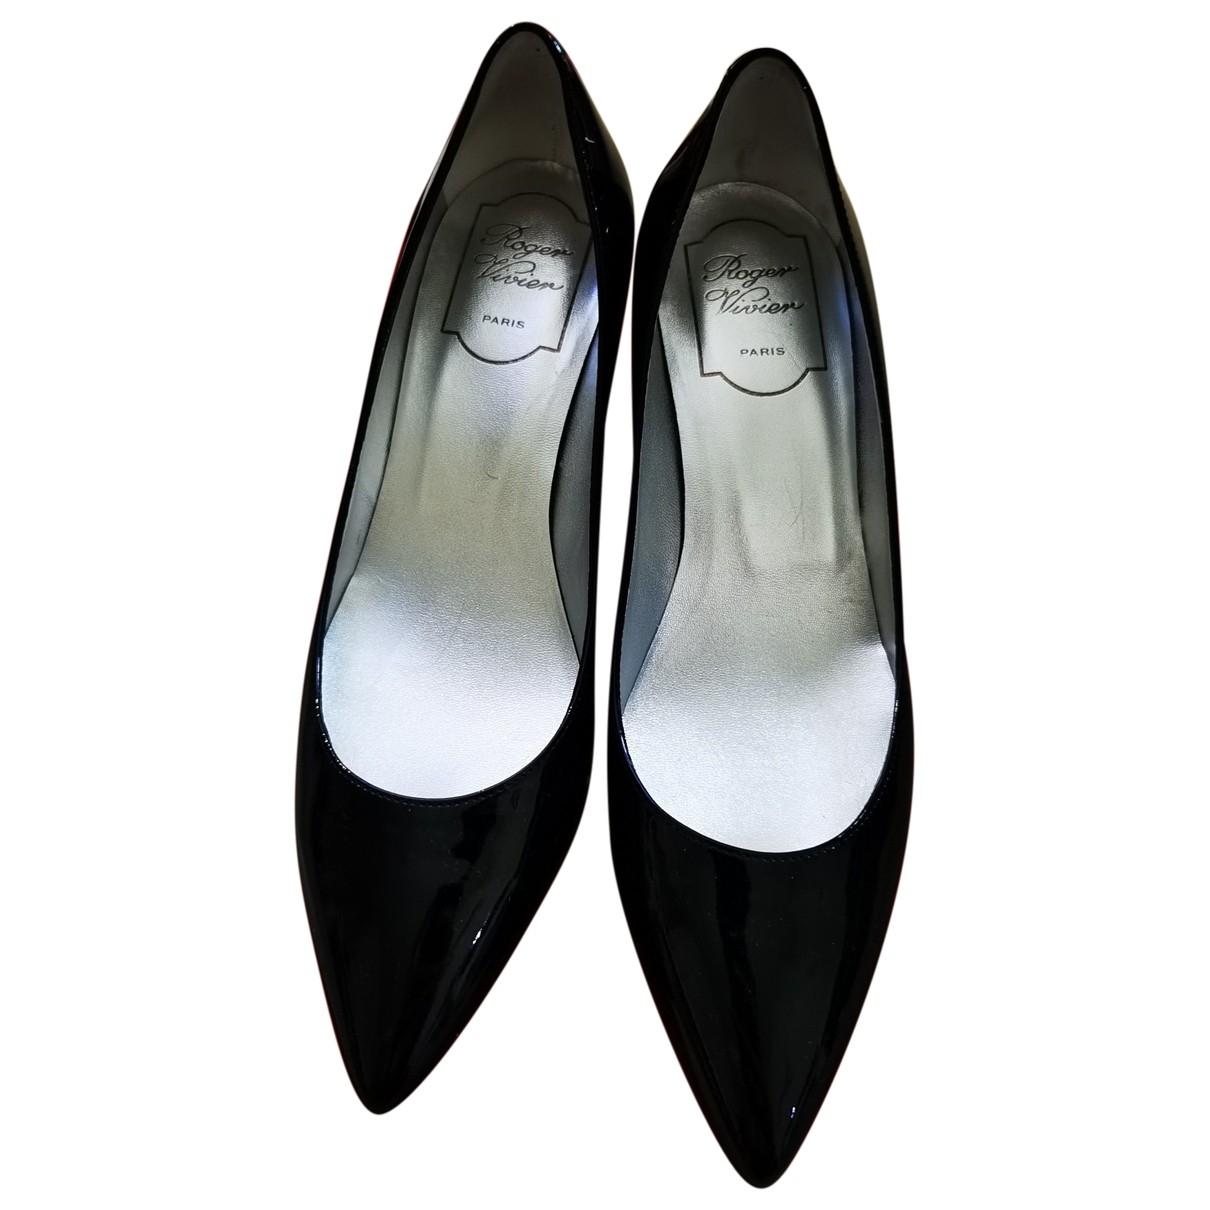 Roger Vivier \N Black Patent leather Heels for Women 36 IT